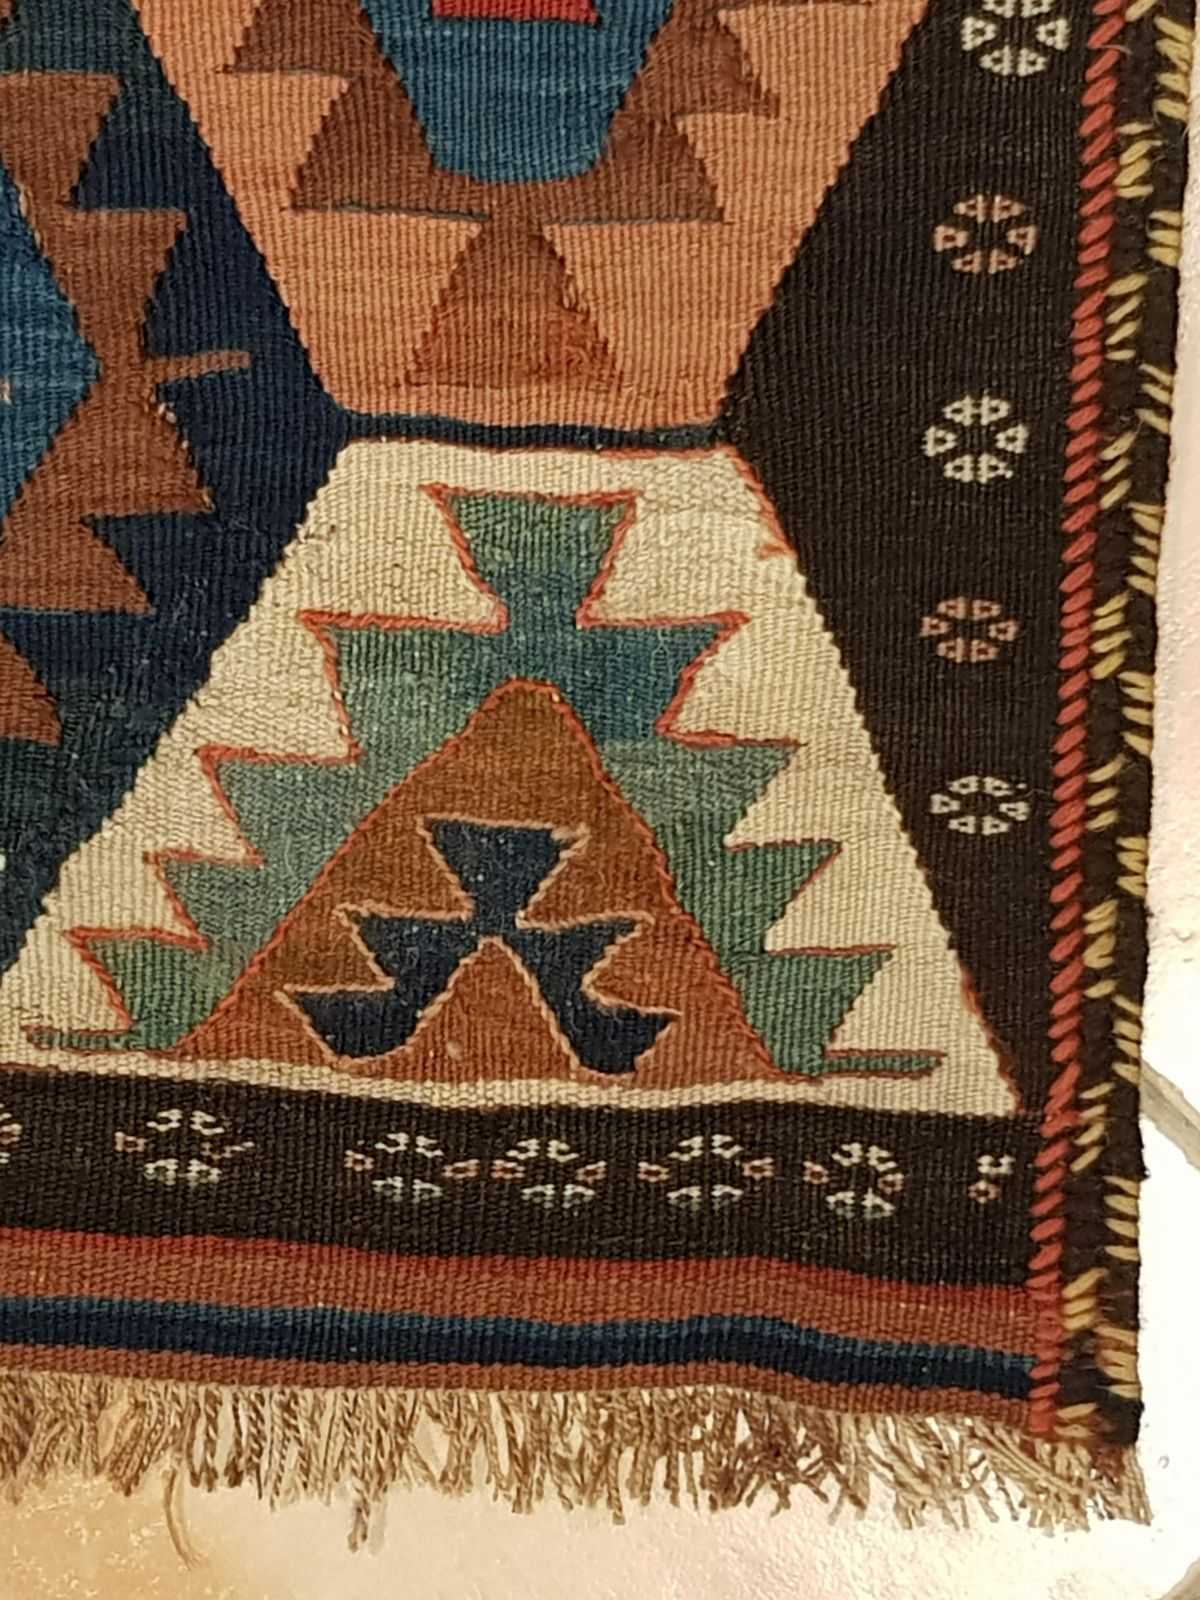 achat tapis marseille achat tapis aix en provence achat tapis cannes achat tapis nice achat. Black Bedroom Furniture Sets. Home Design Ideas